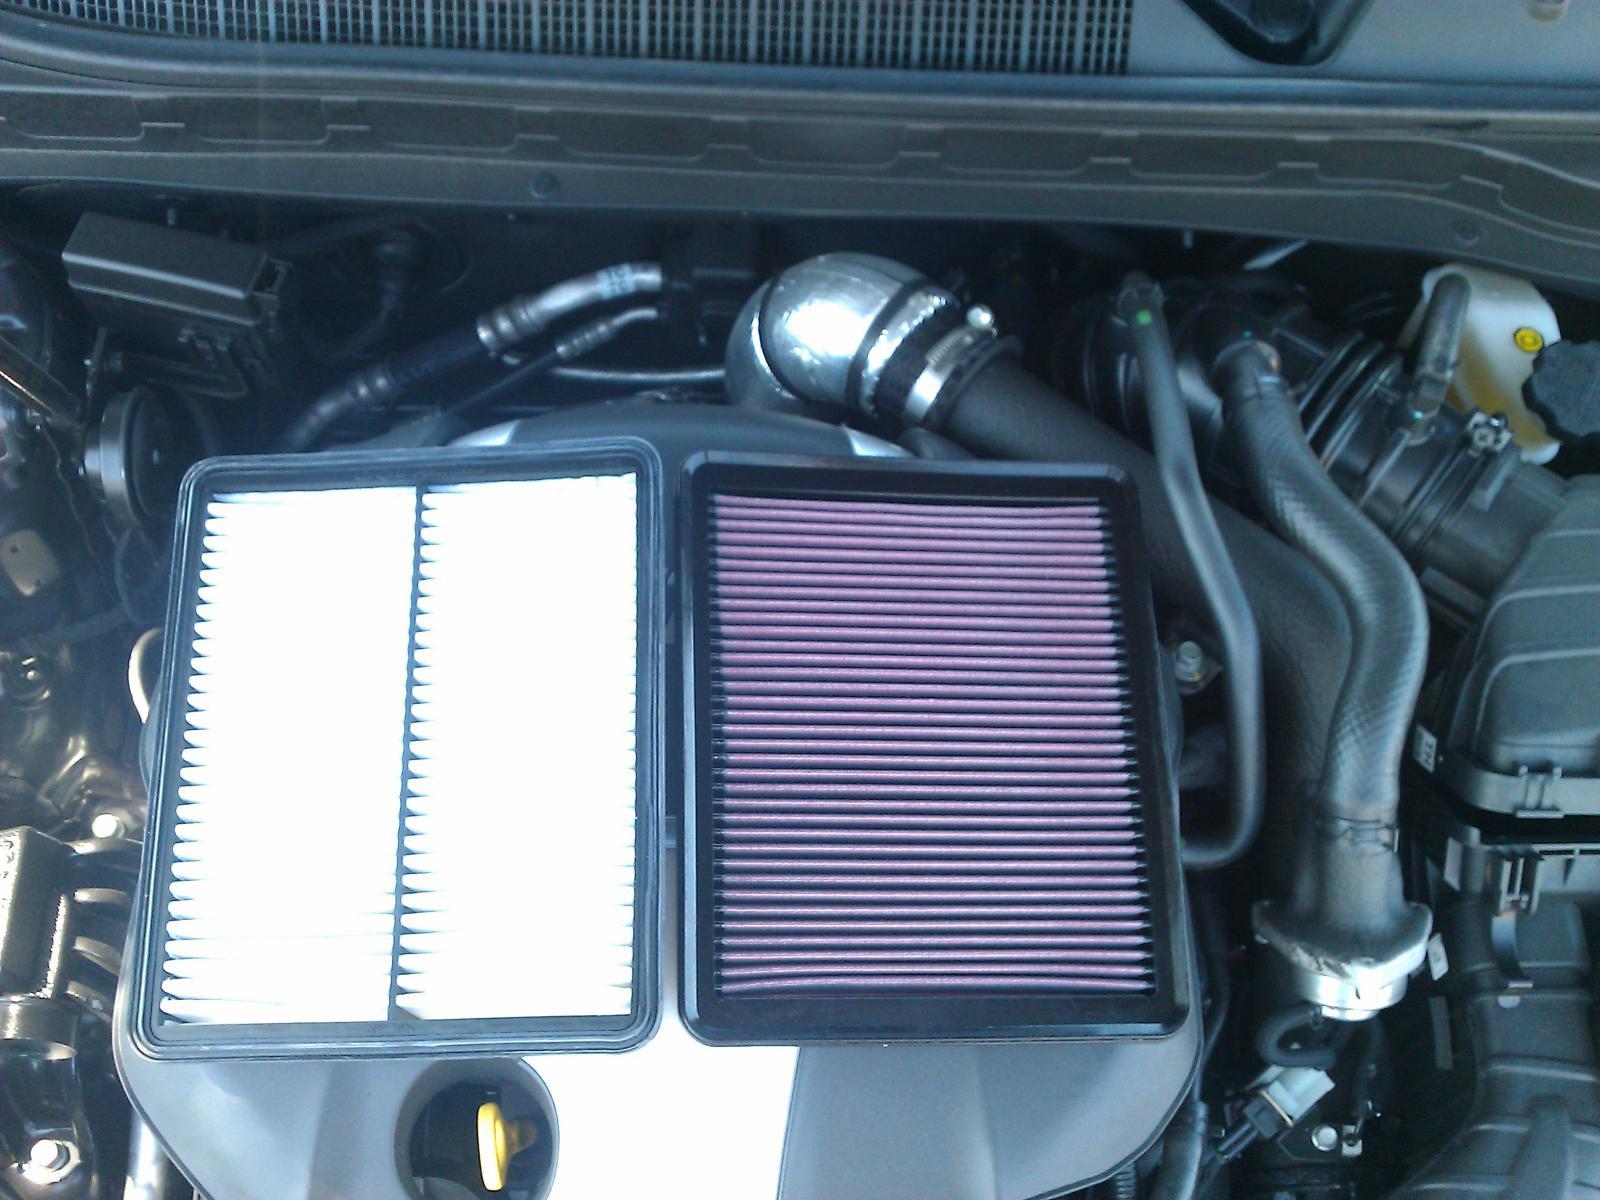 Kia Optima: Air cleaner